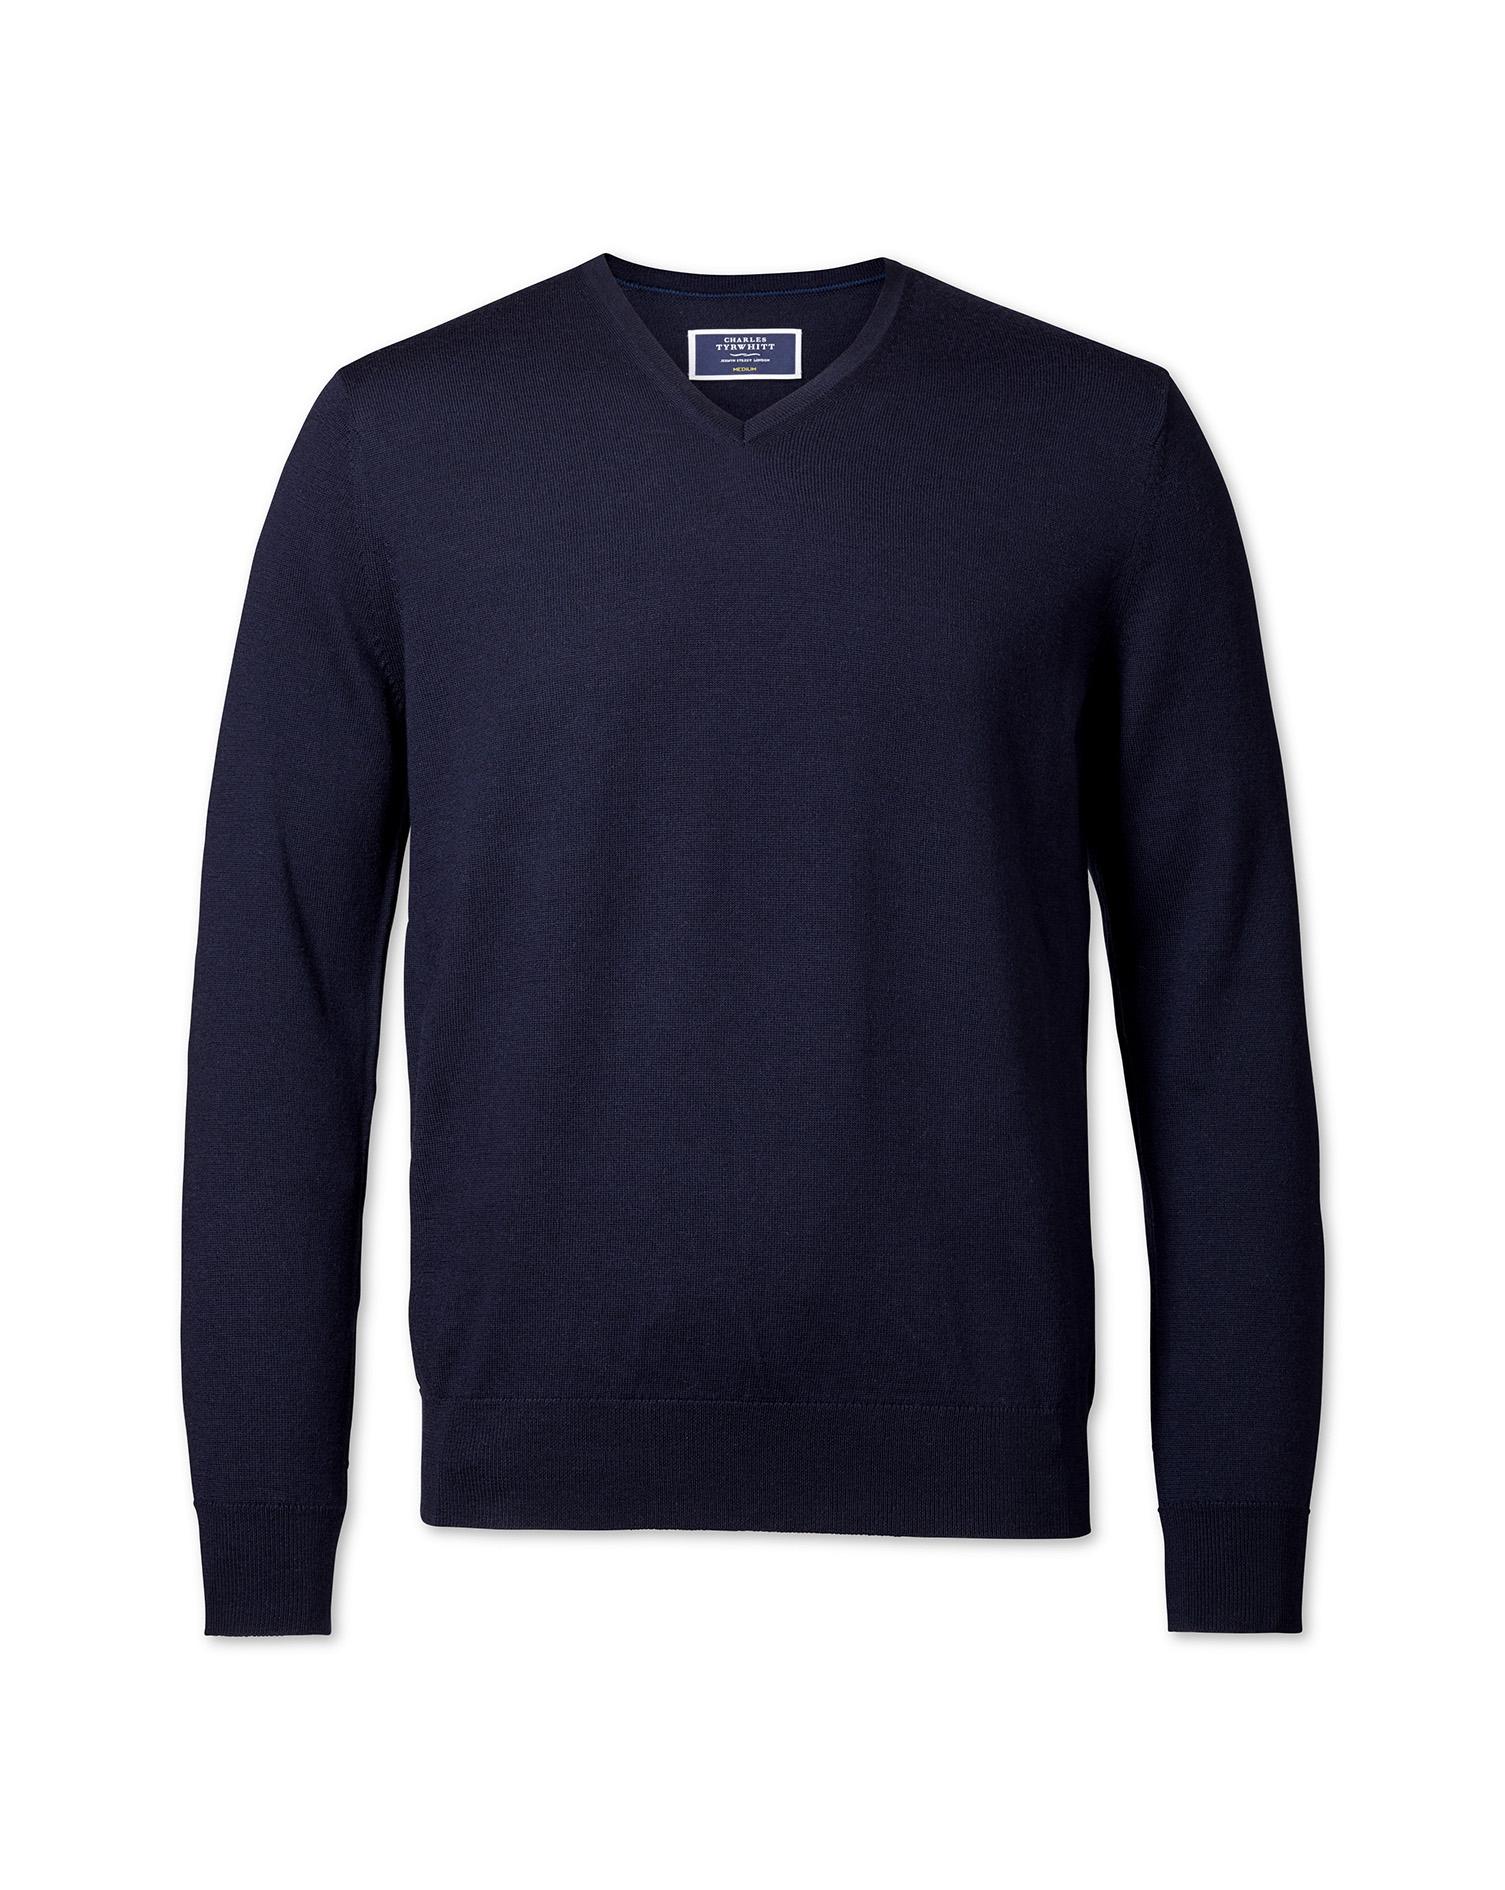 Navy Merino Wool V-Neck Jumper Size Large by Charles Tyrwhitt